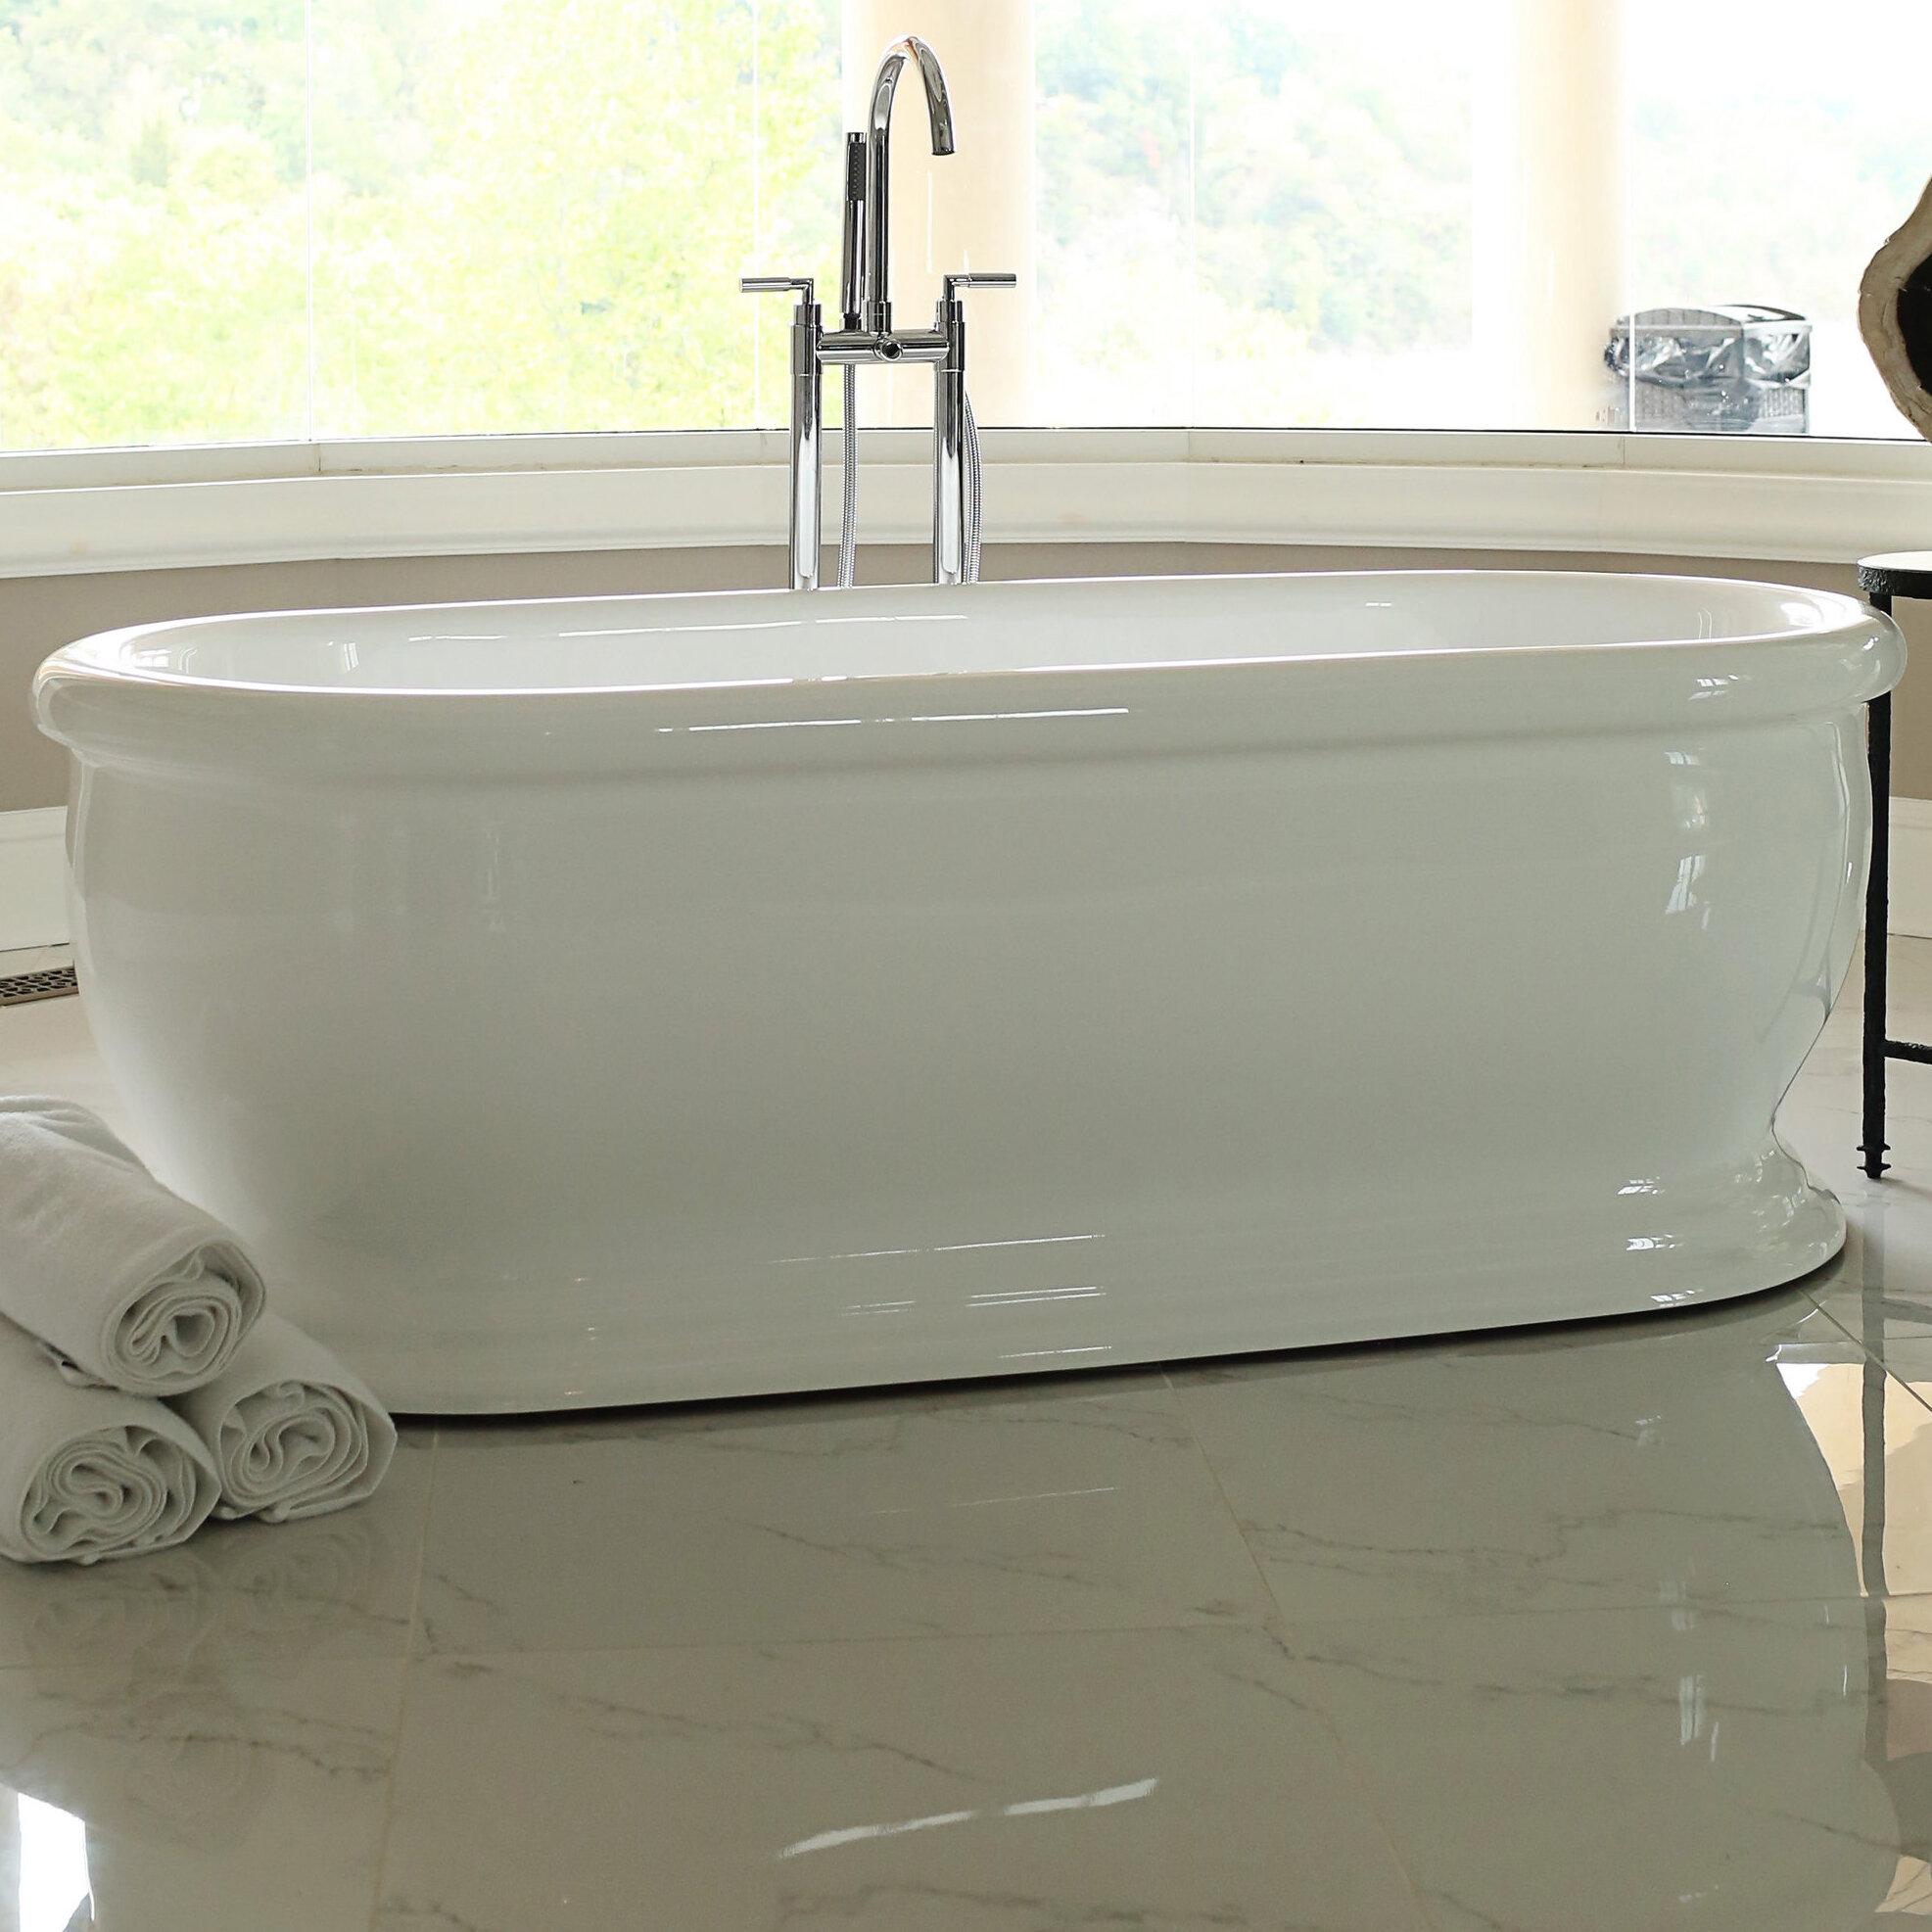 Cute Center Drain Bathtubs Pictures Inspiration - Bathtub Design ...